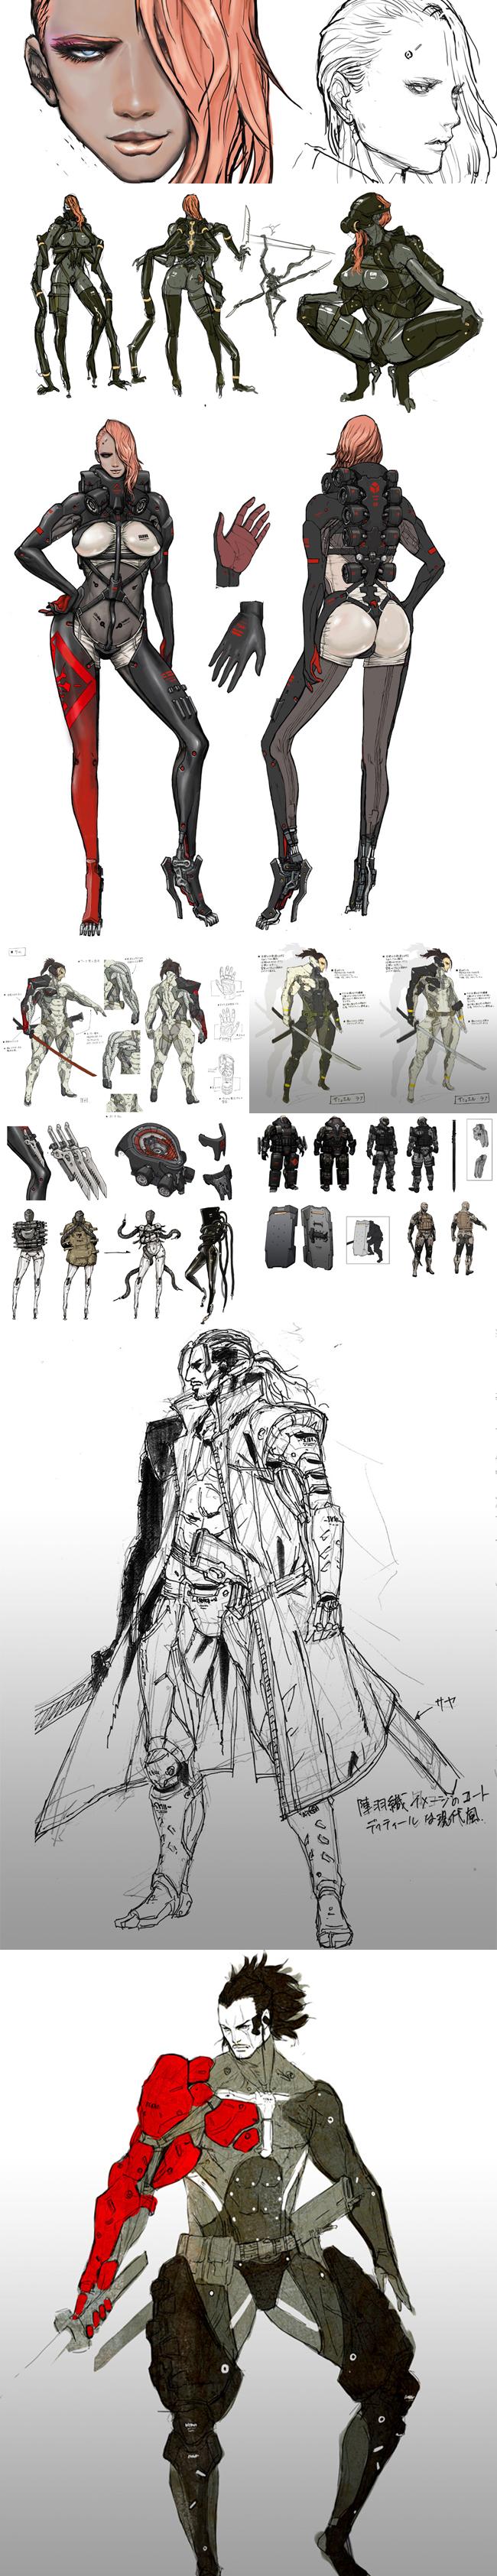 arte-digital-videojuegos-academiac10-madrid-comic-aprender